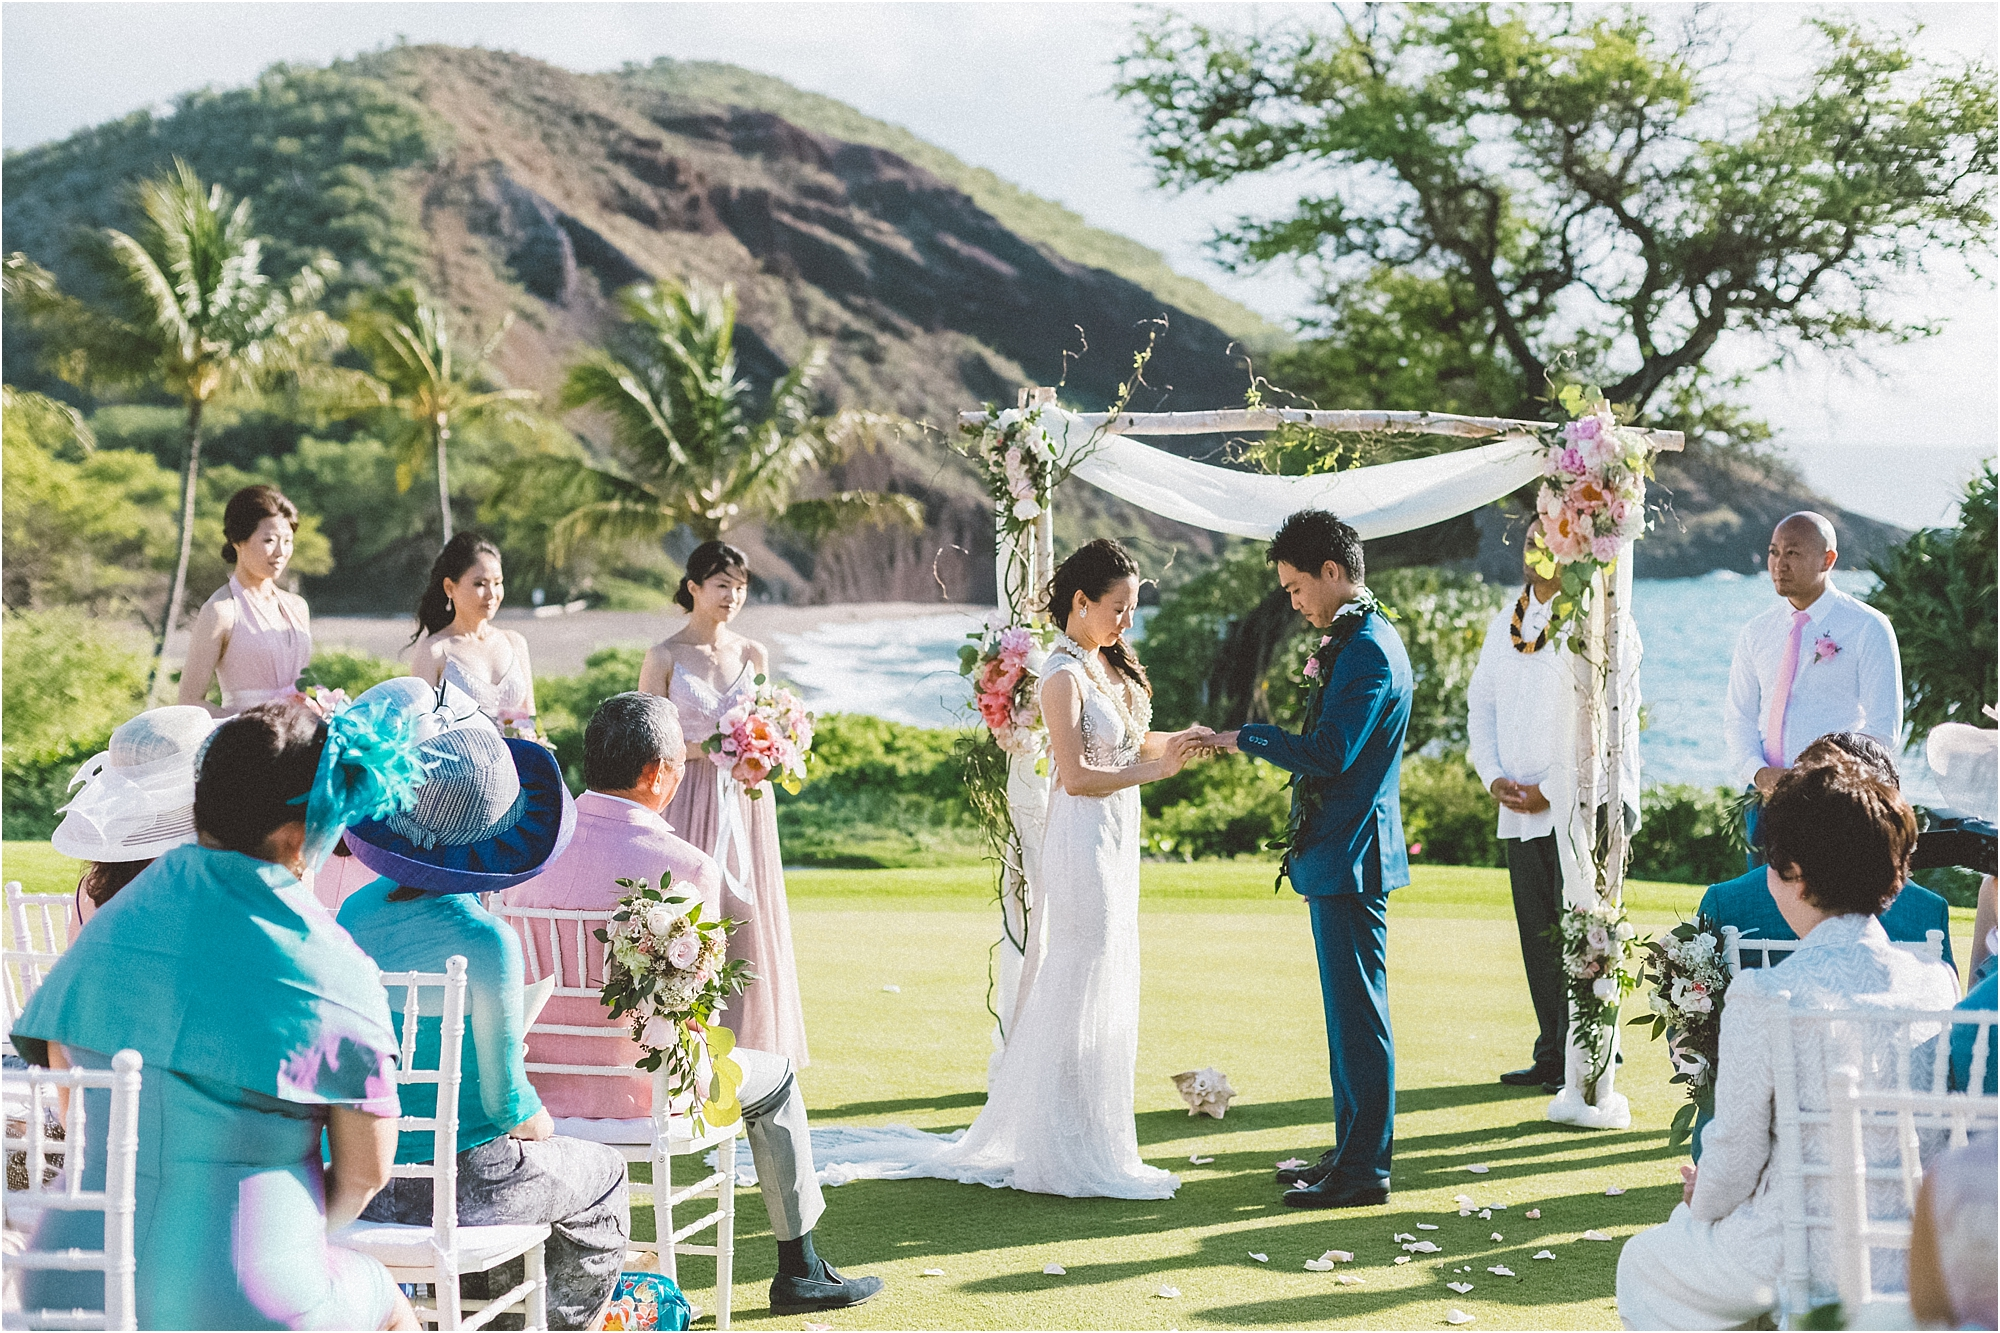 angie-diaz-photography-maui-hawaii-destination-wedding-makena-golf-beach-club_0029.jpg